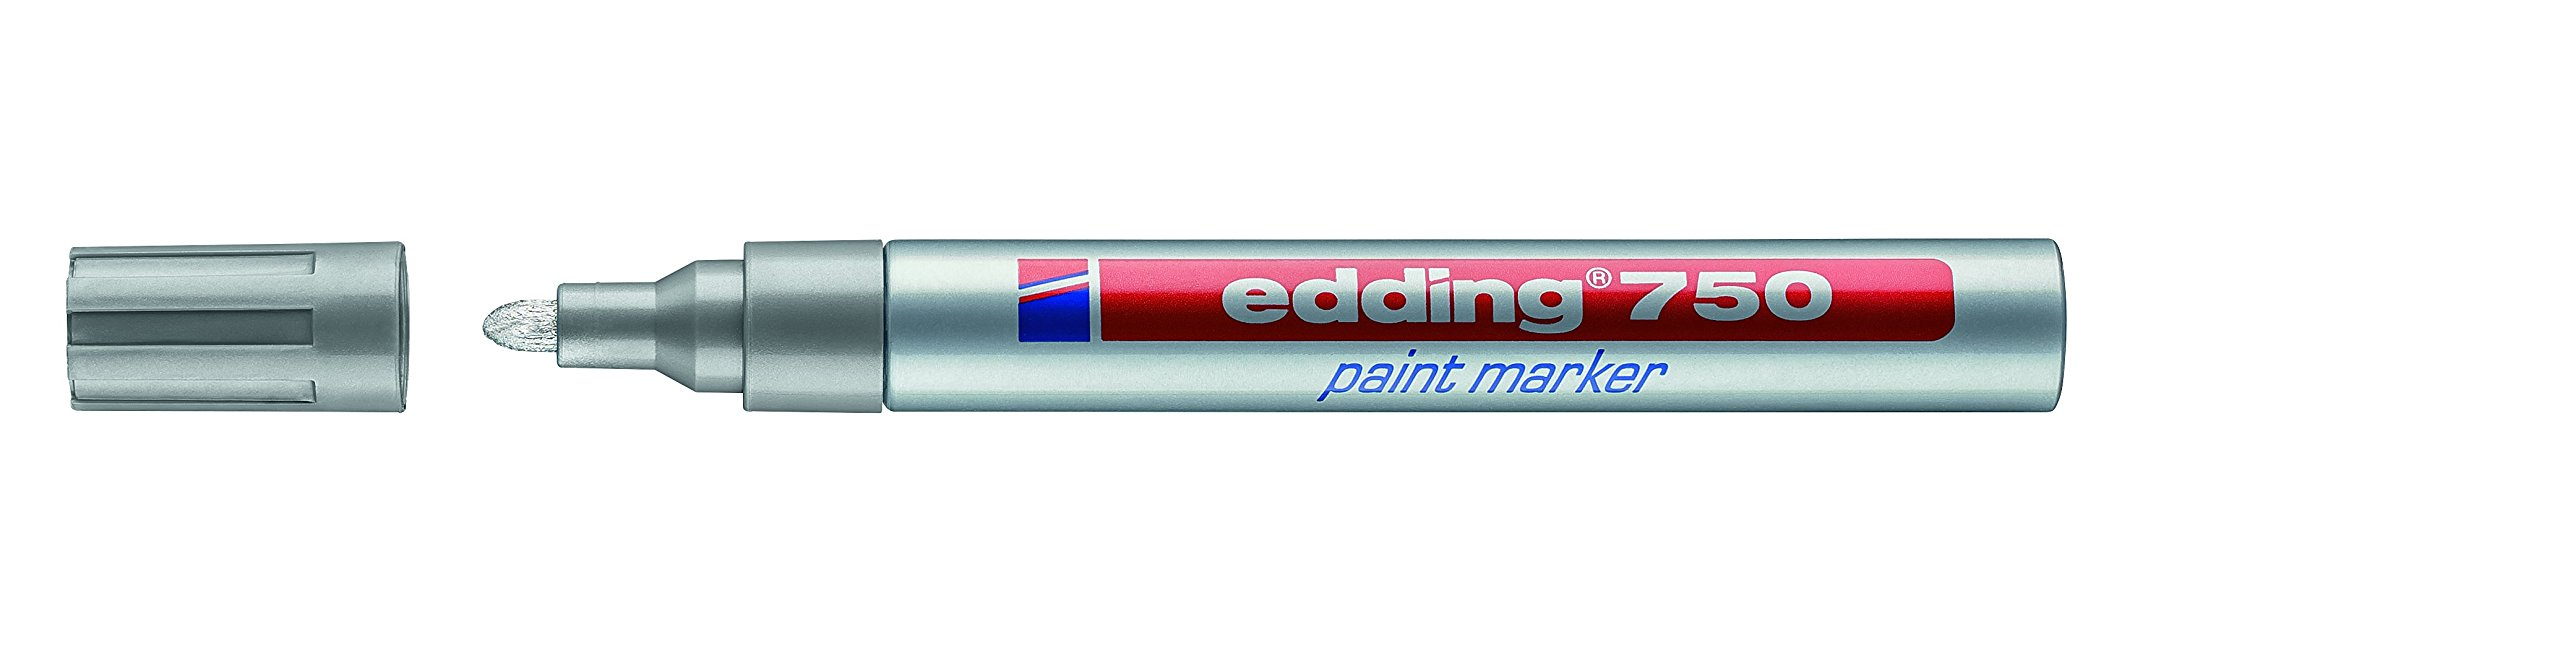 Edding 750 Silver 10pc(s) Paint Marker